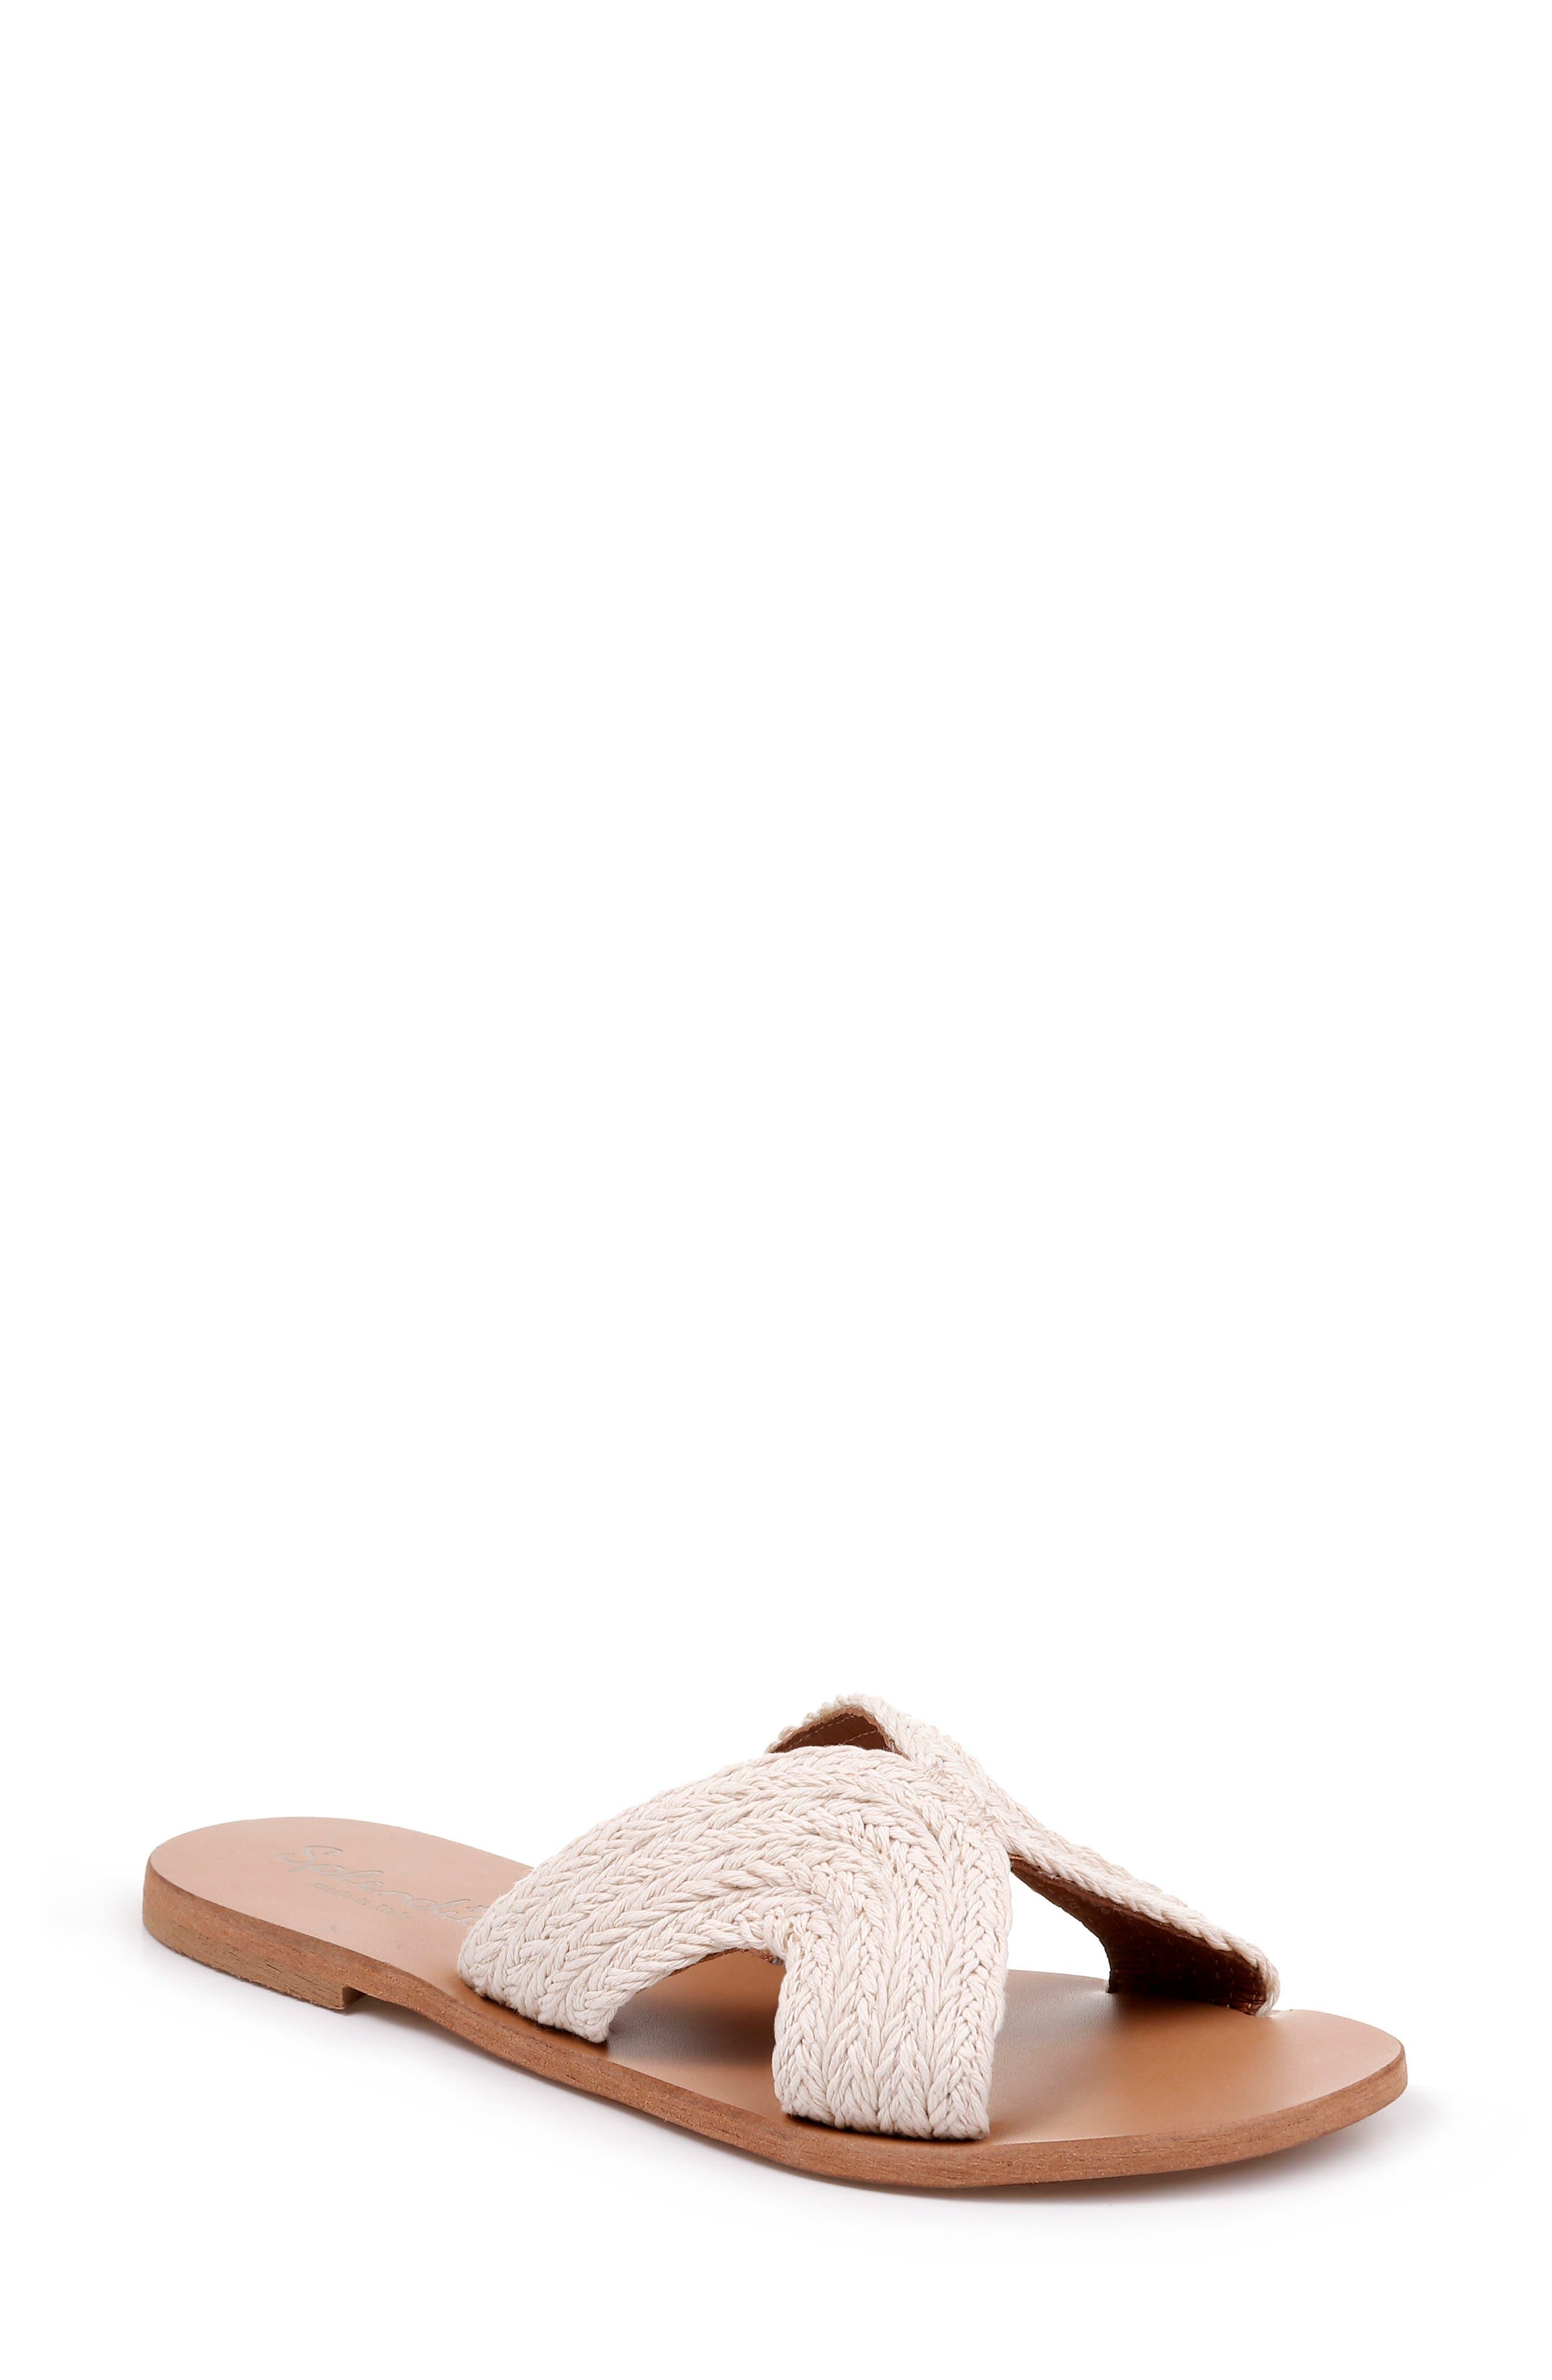 Sydney Woven Slide Sandal, Main, color, CREAM FABRIC